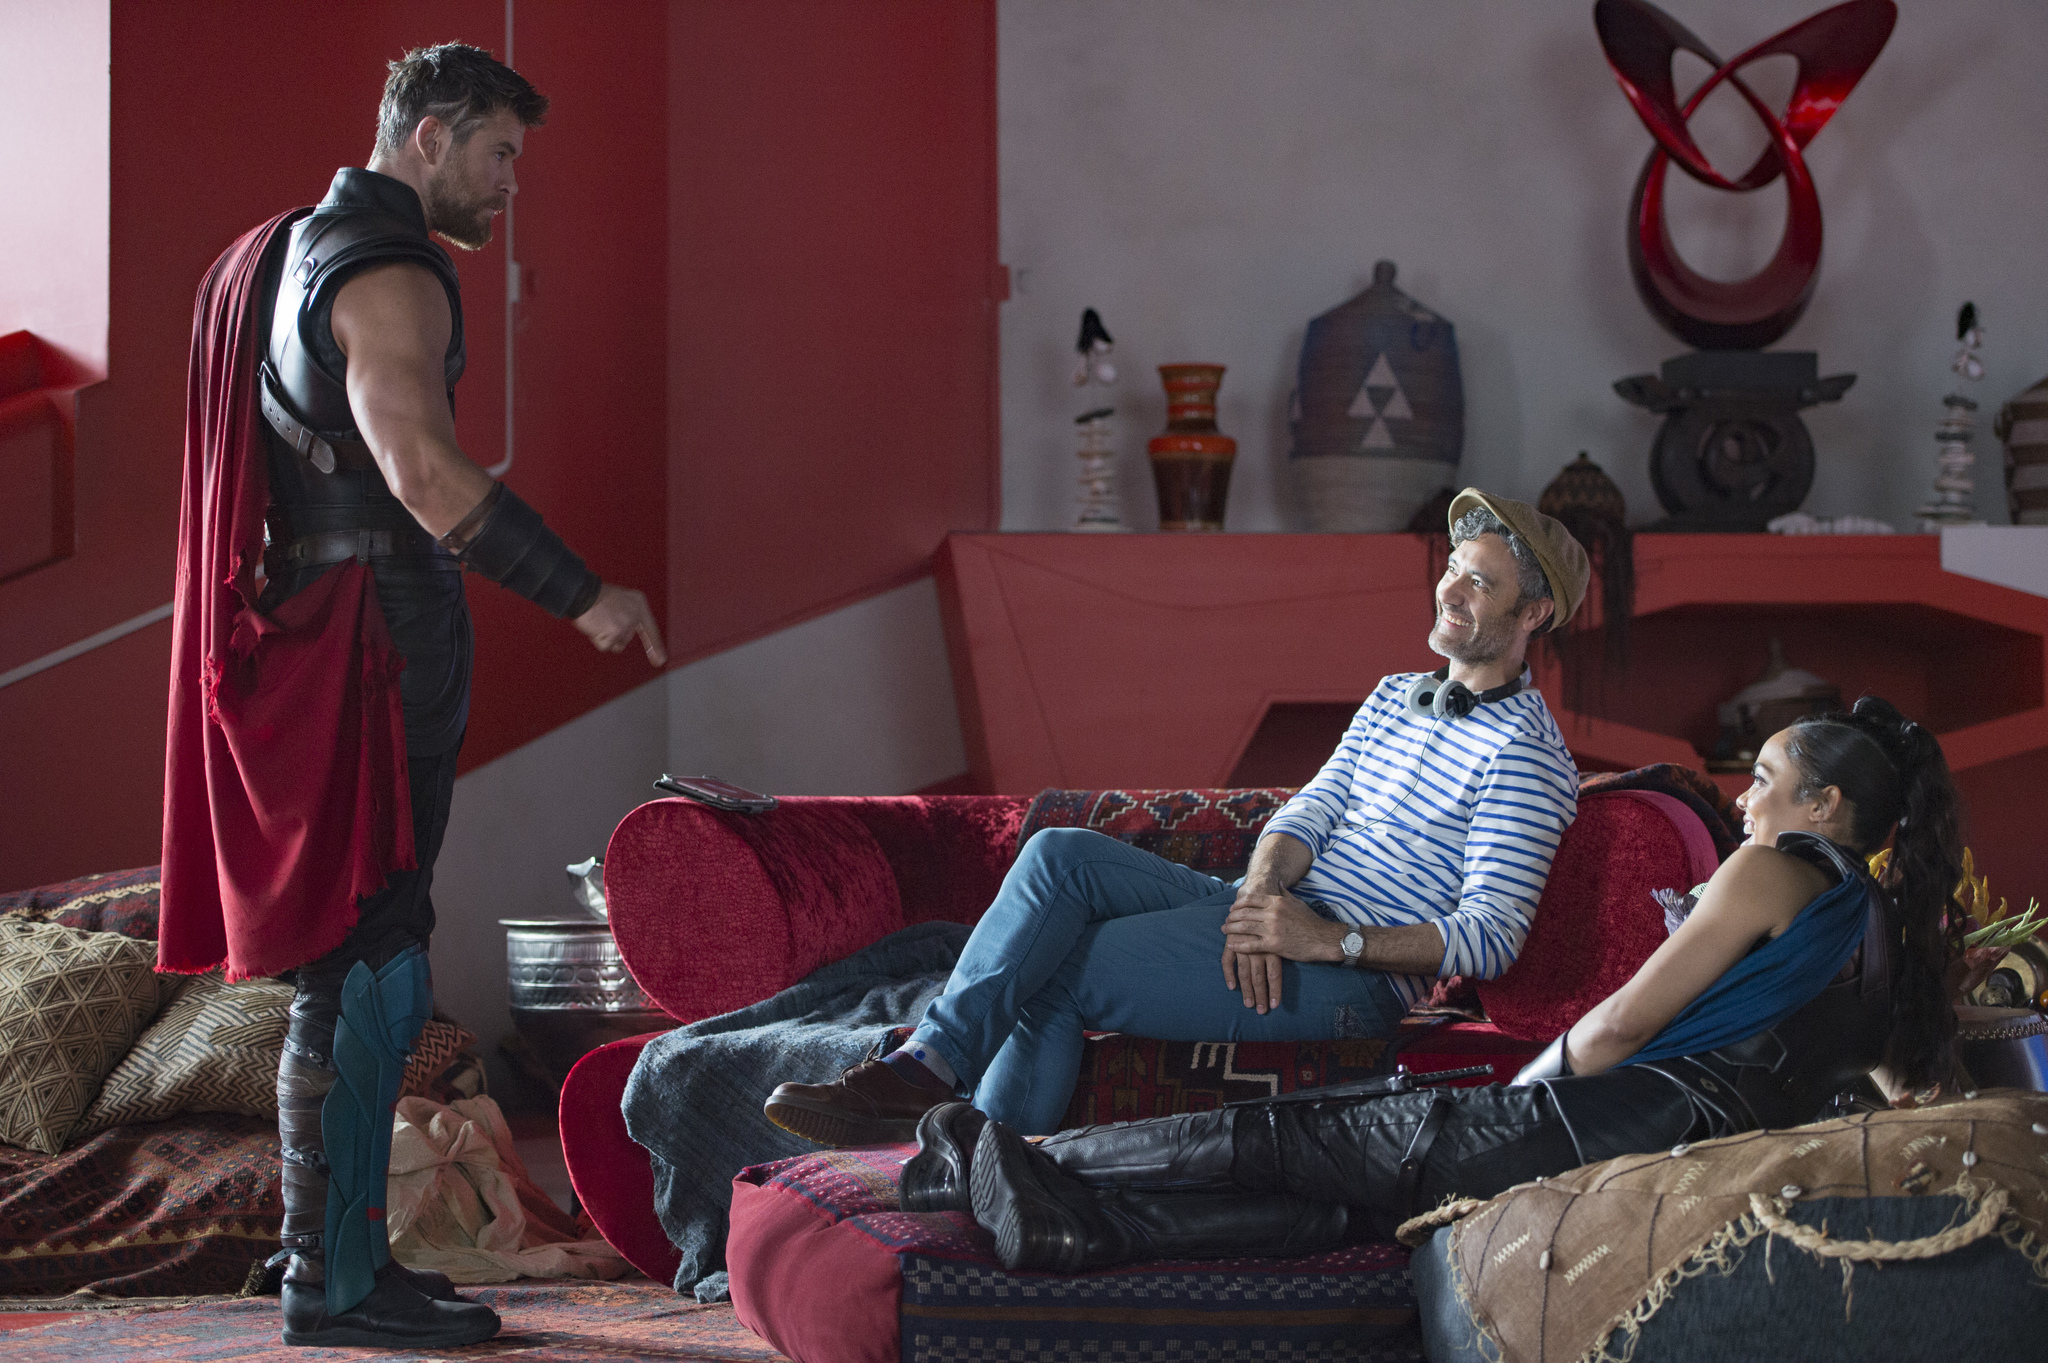 Taika Waititi, Chris Hemsworth, and Tessa Thompson in Thor: Ragnarok (2017)